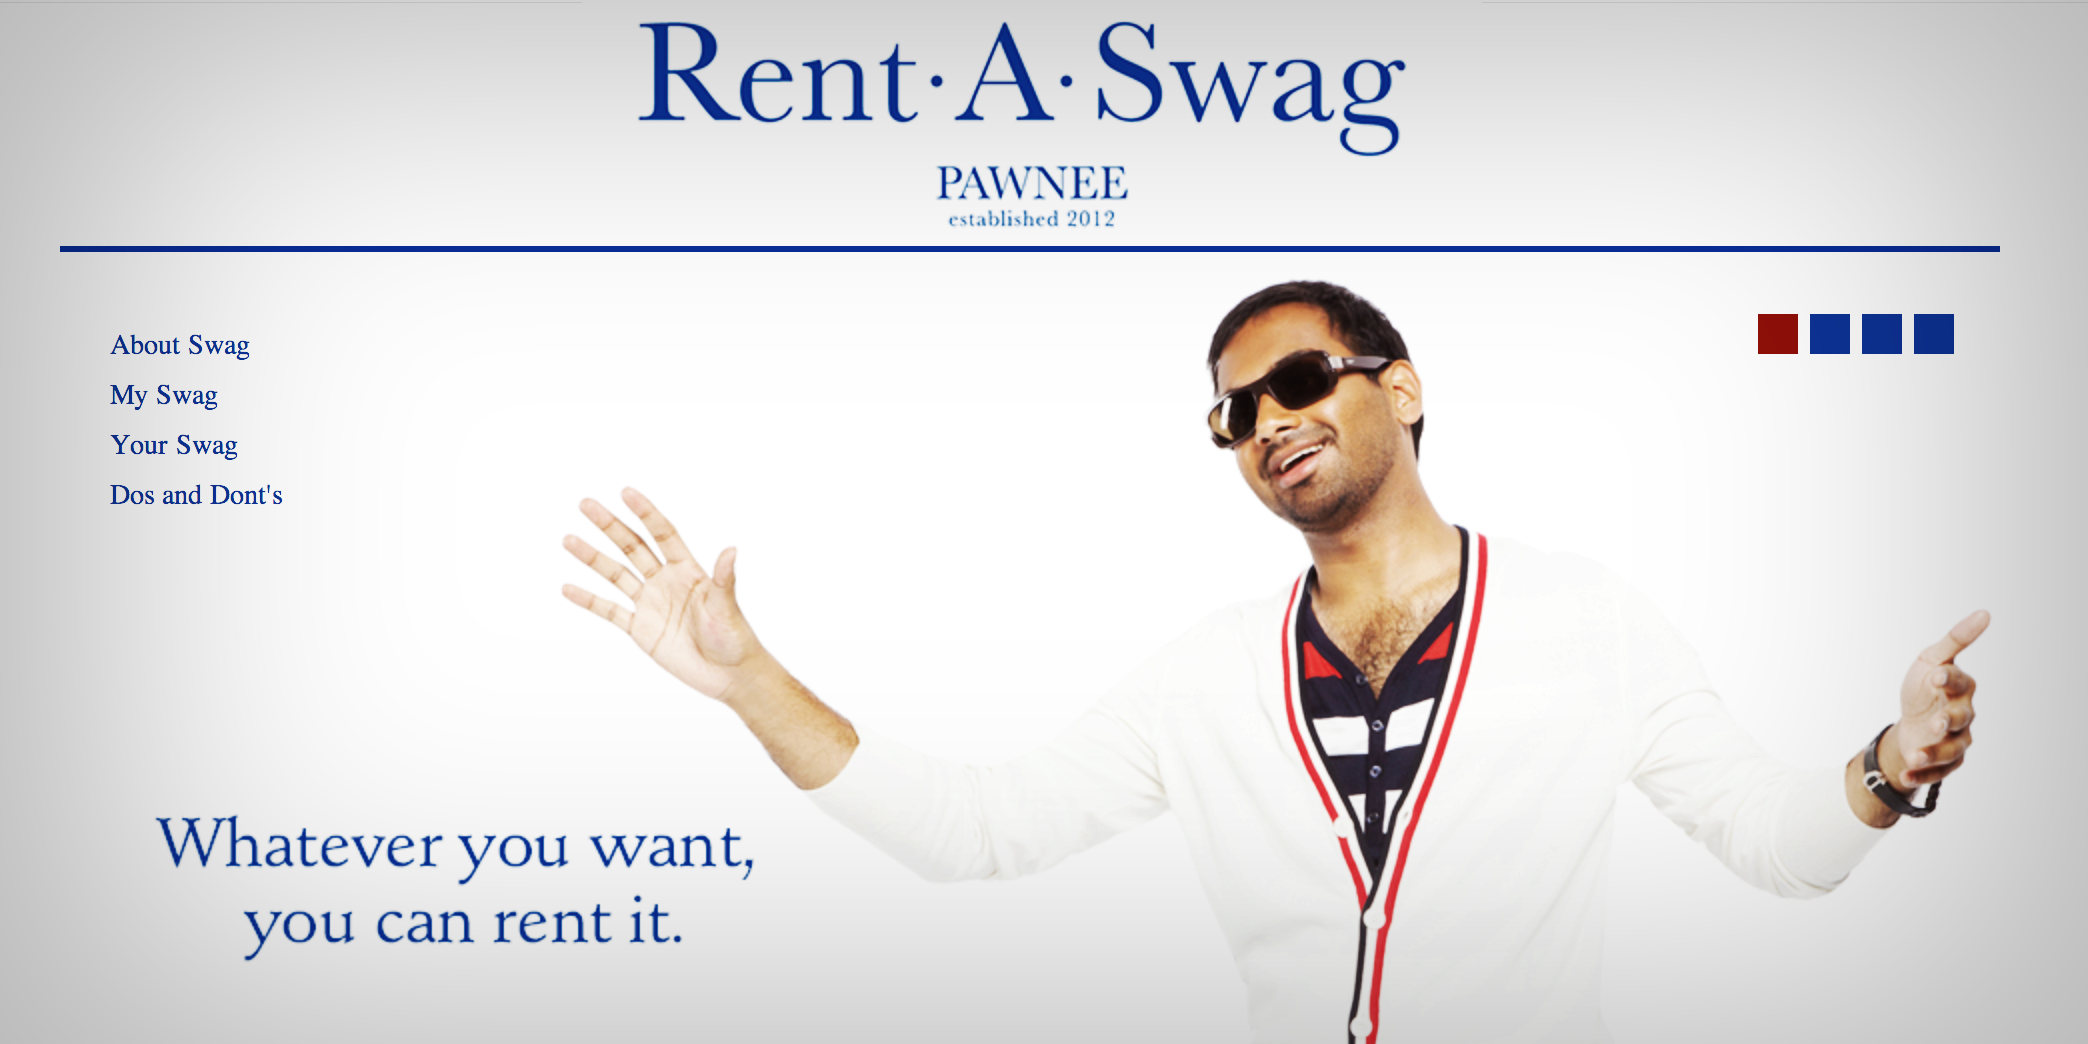 rent-a-swag